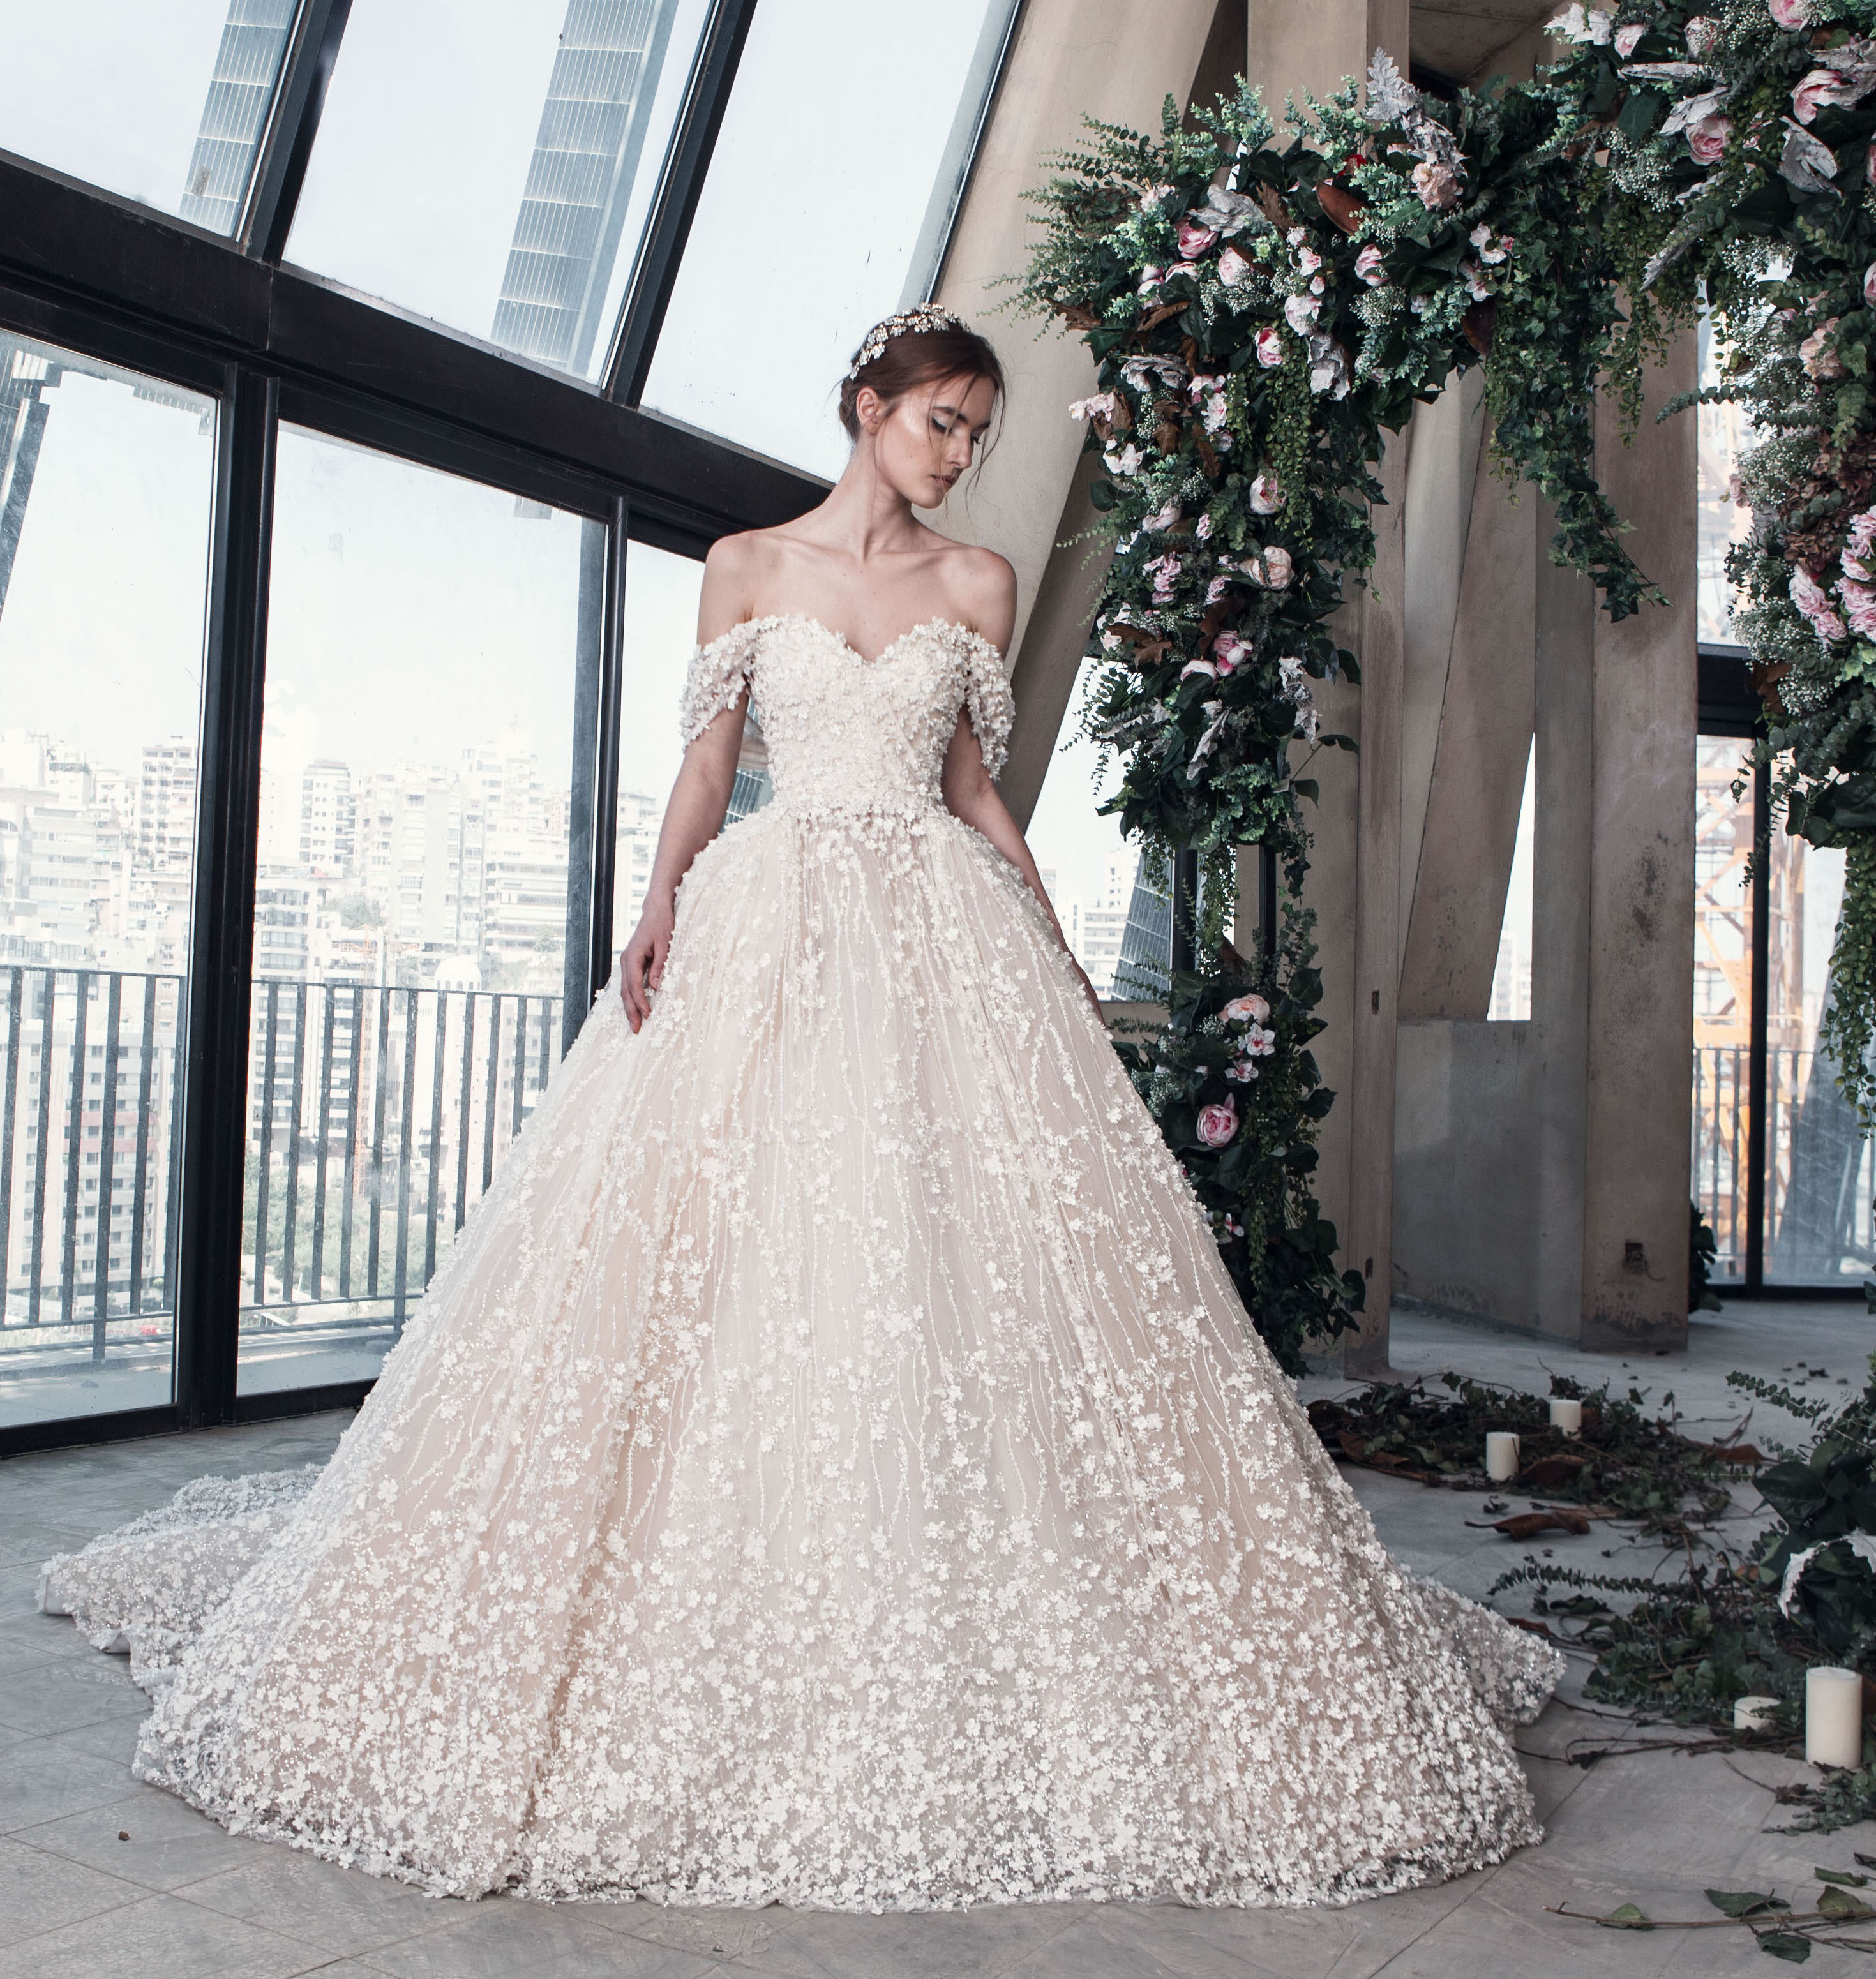 صورة احدث فساتين الزفاف , صور فساتين زفاف موضه 2019